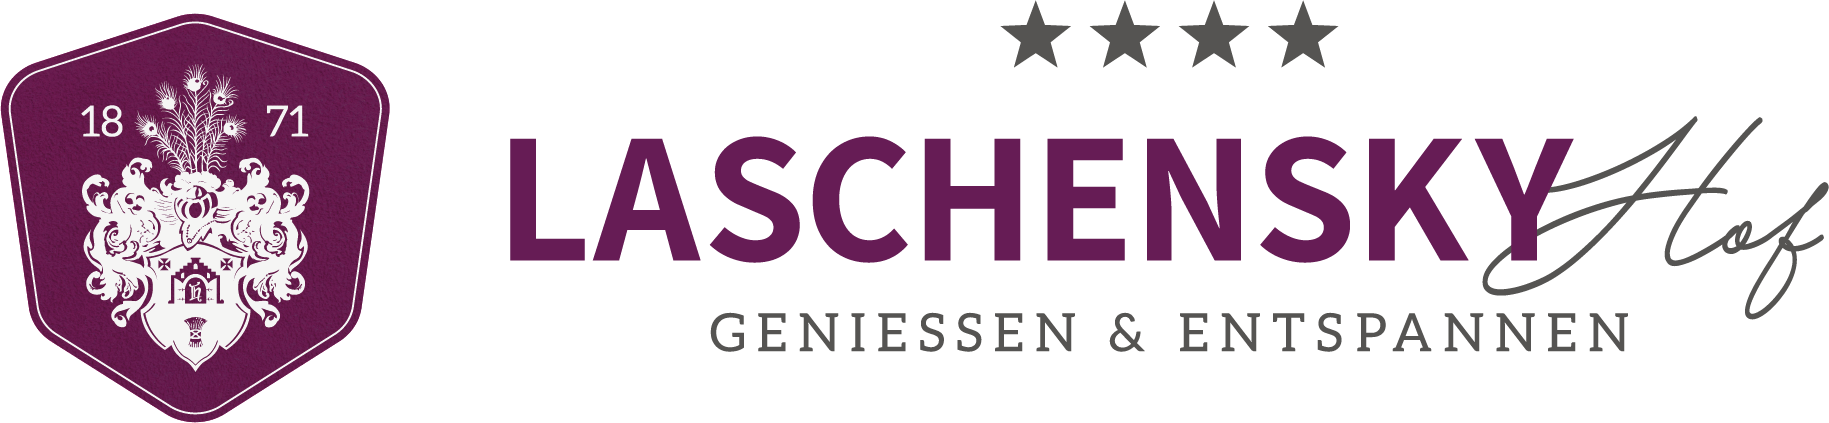 Laschensky